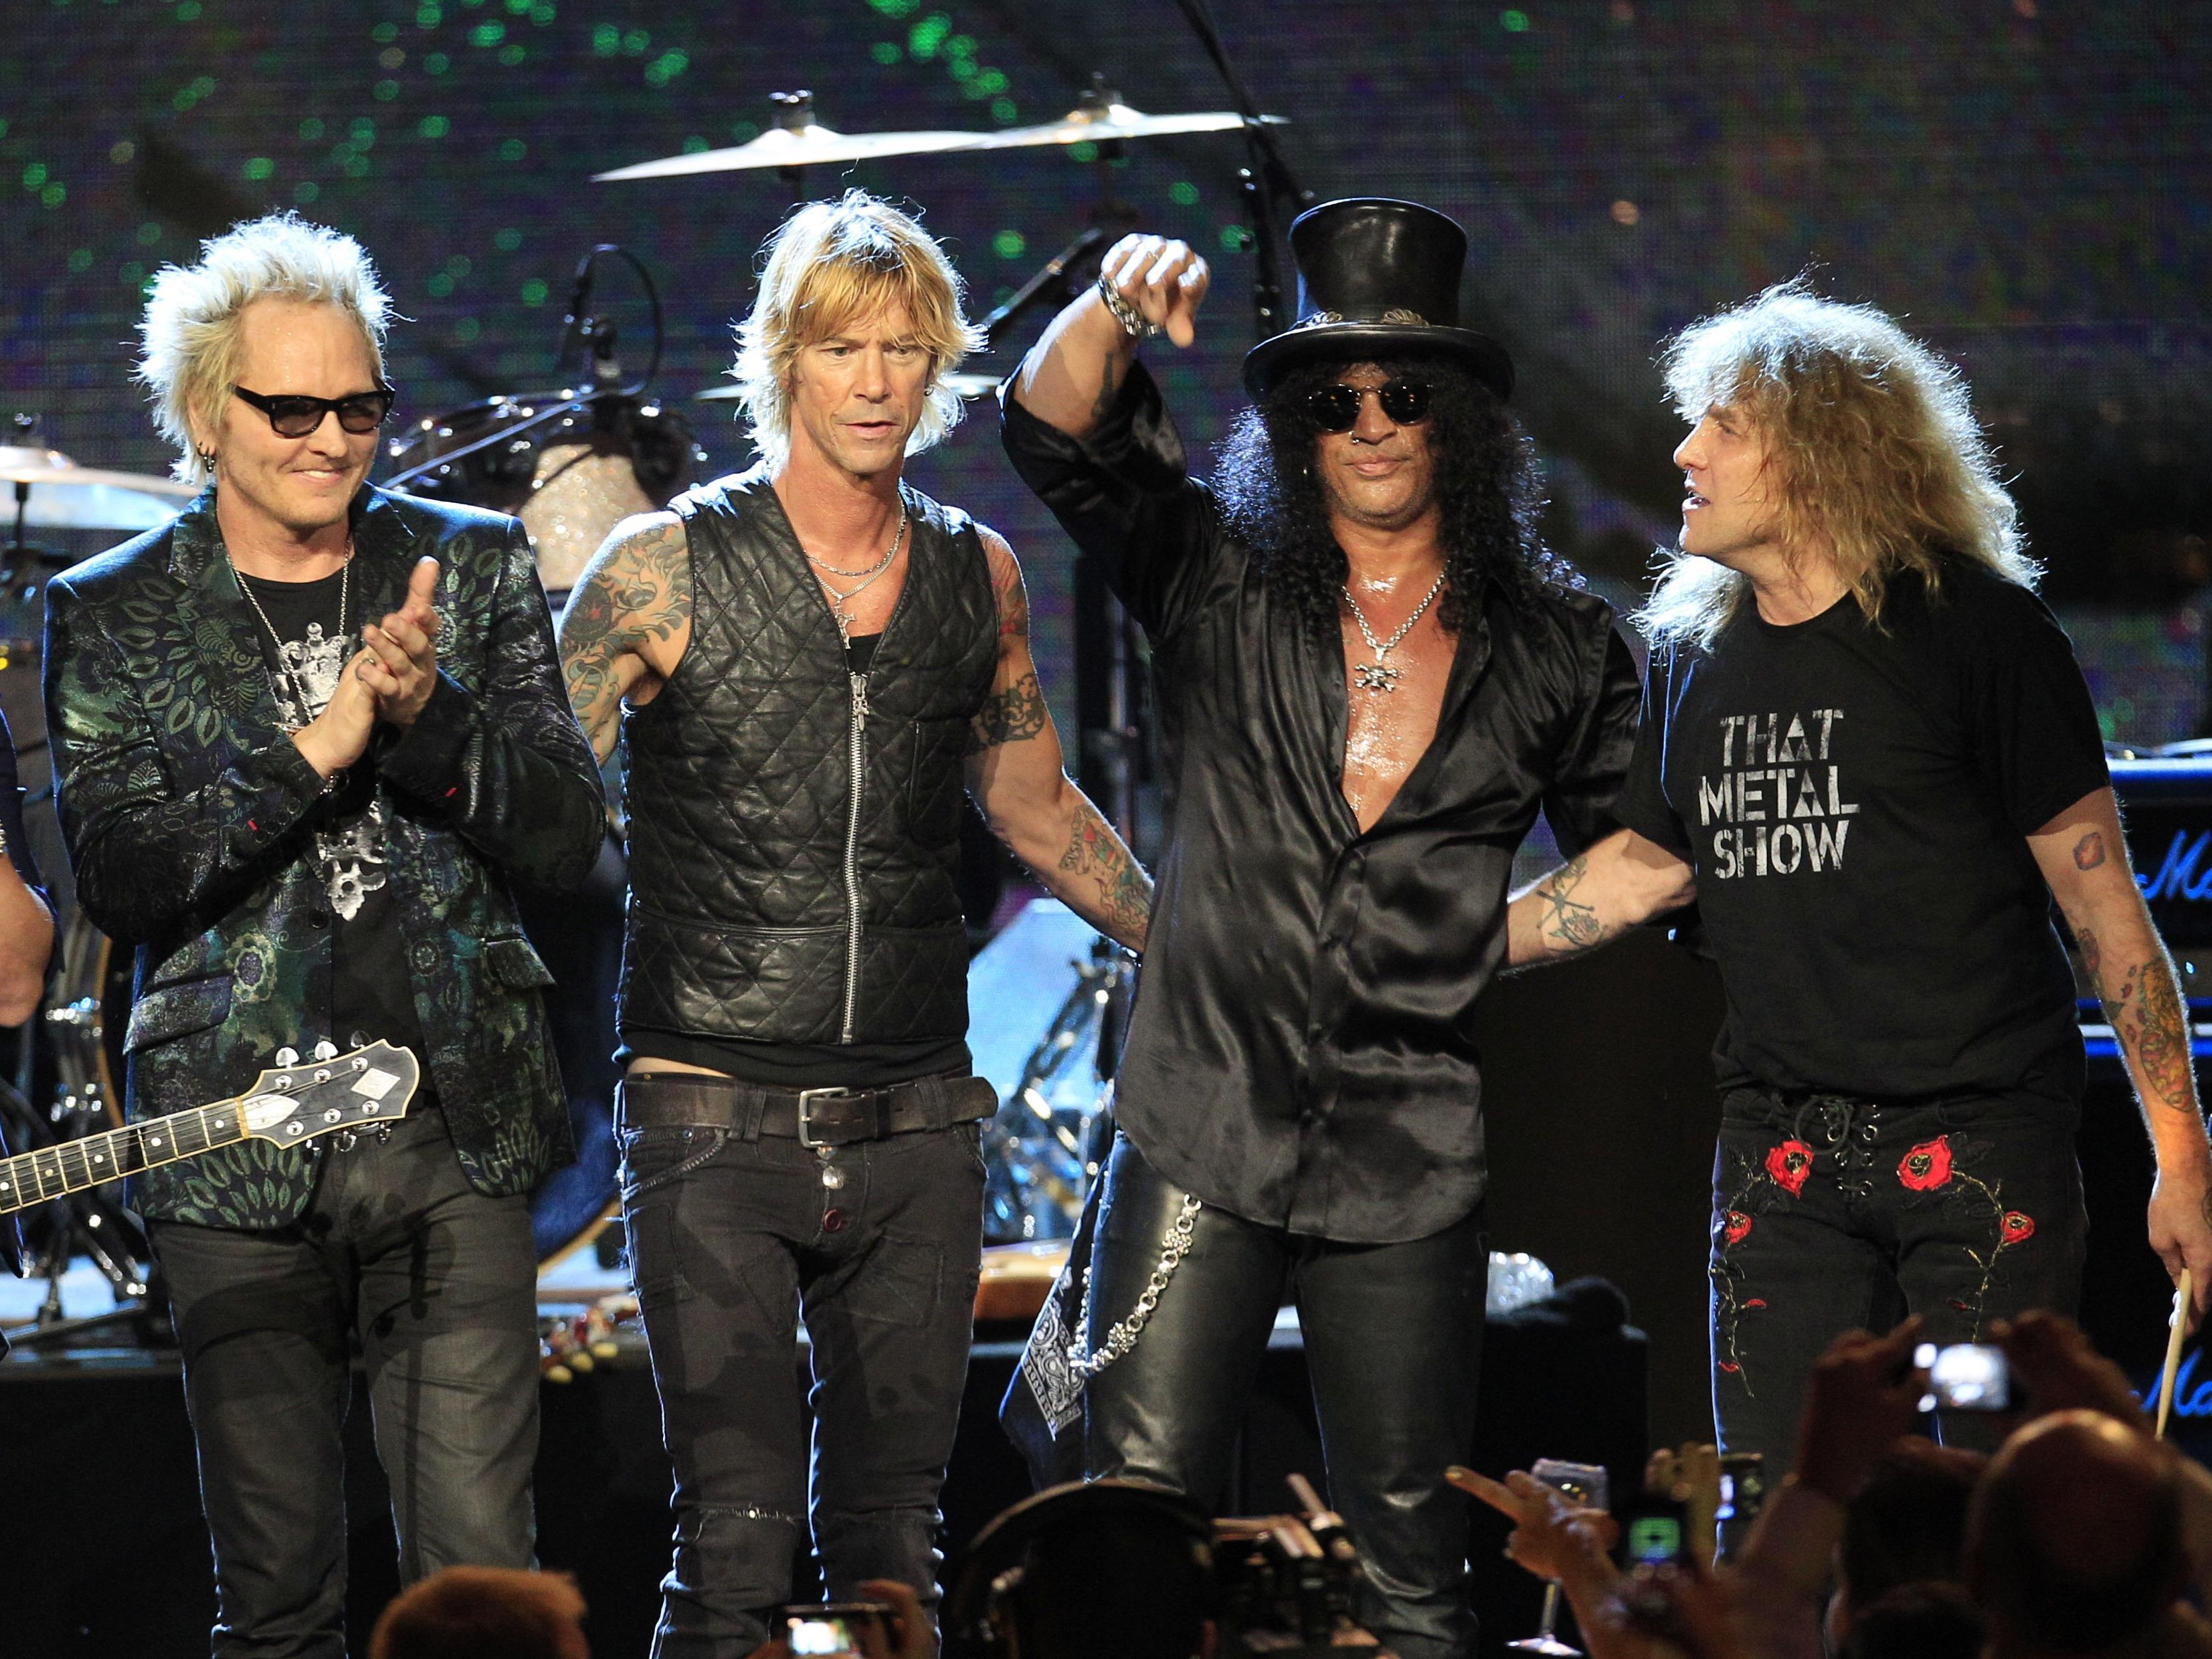 Am 7. Juni gastieren Guns n' Roses in Zürich